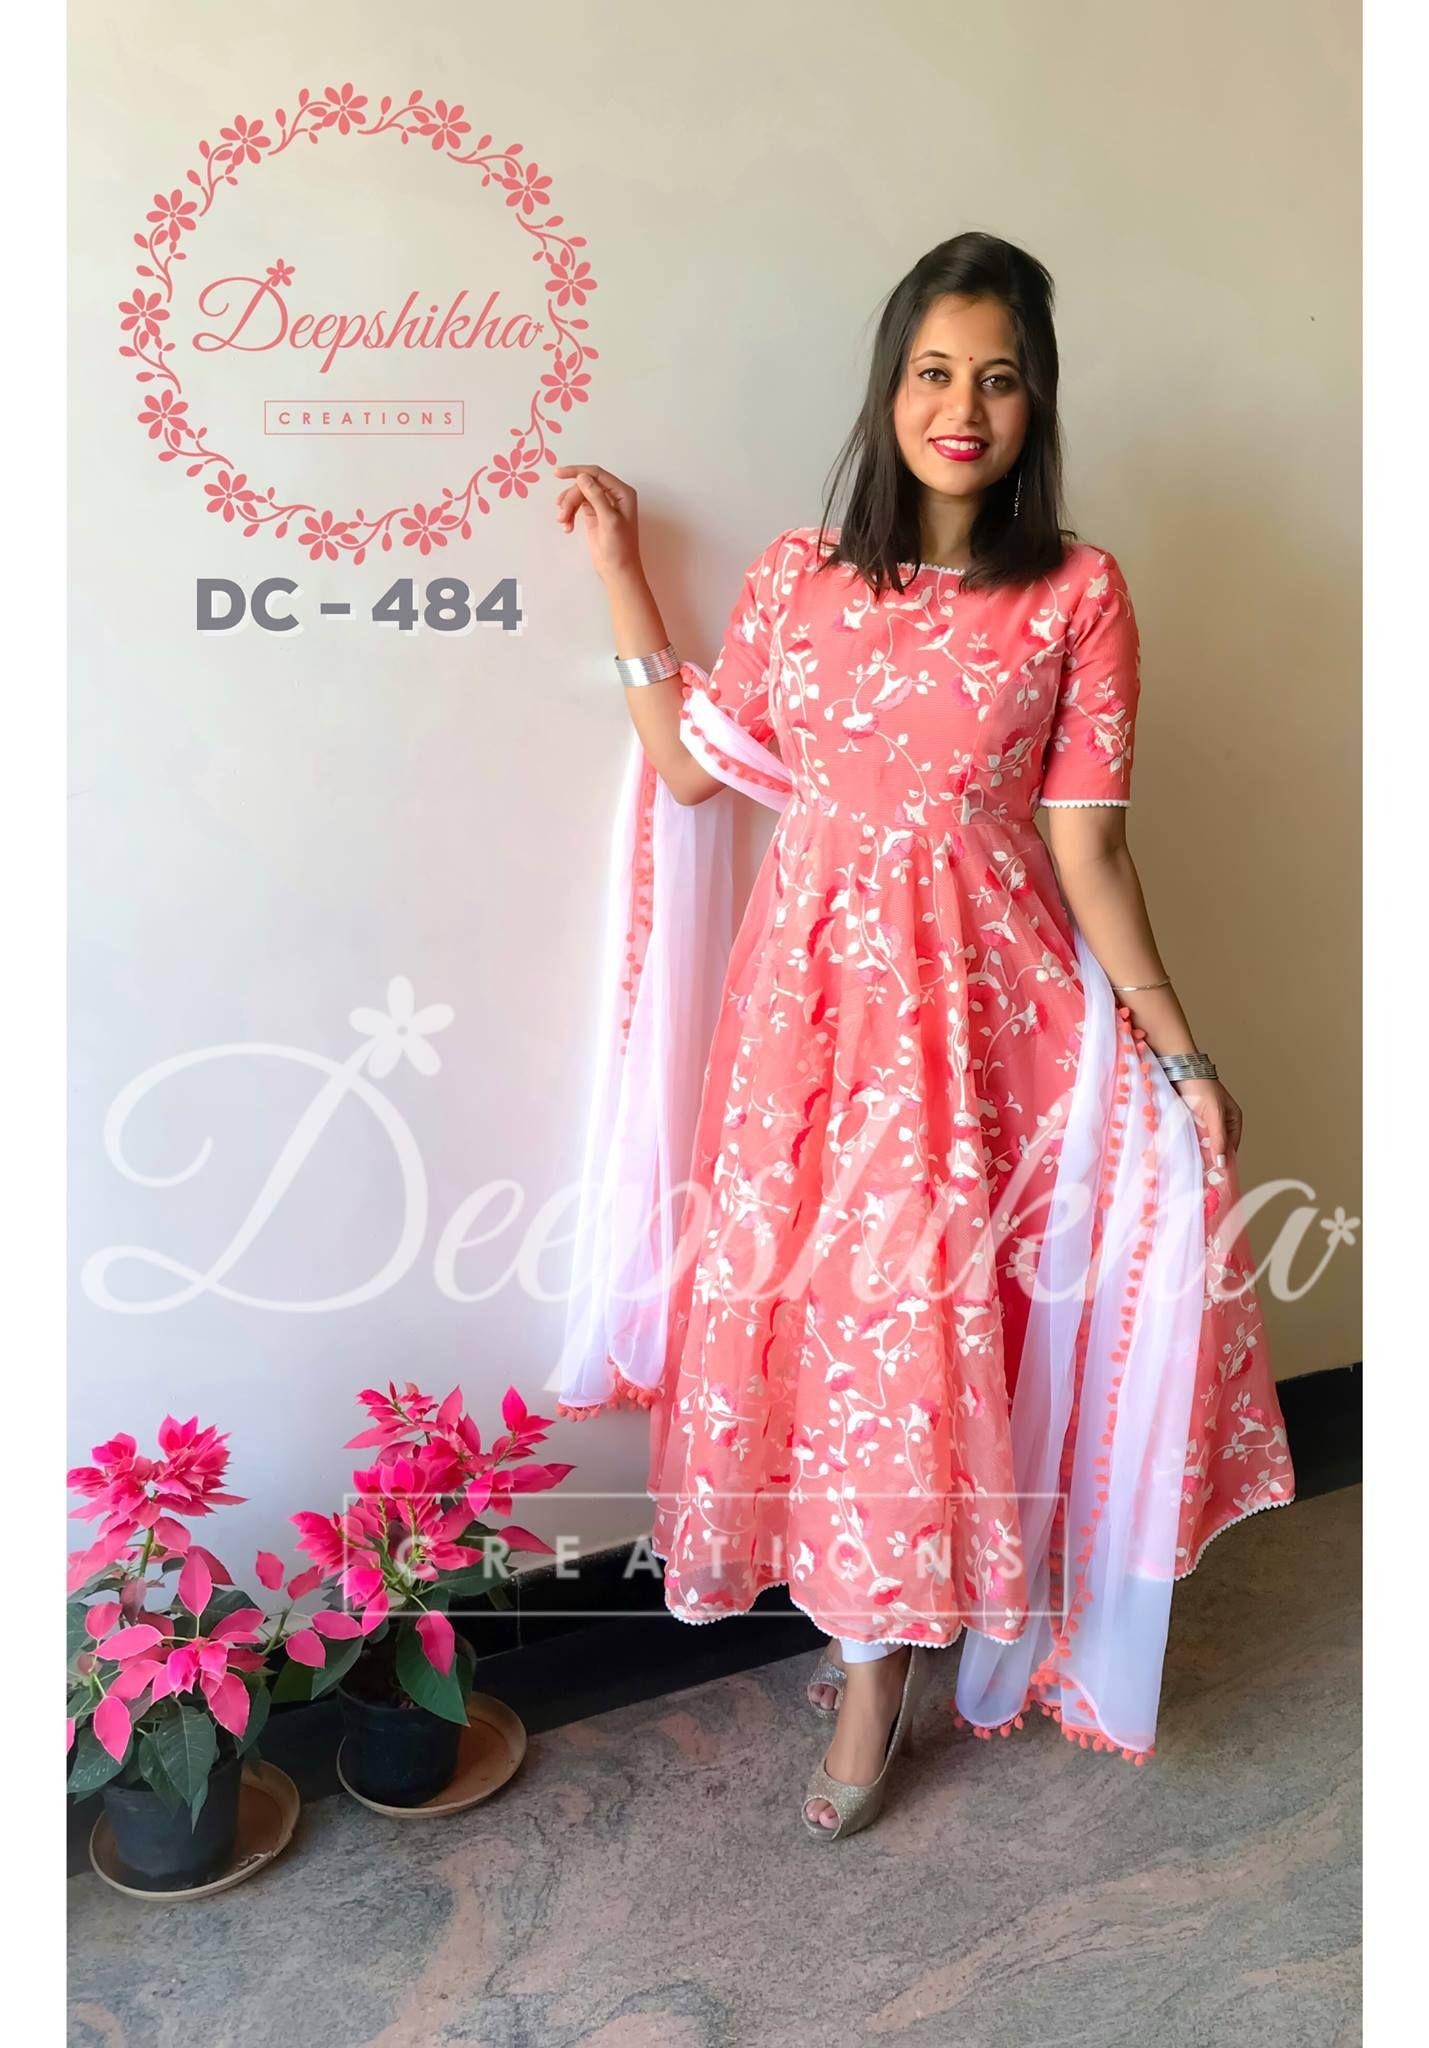 Beautiful Pink Color Floor Length Anarkali Dress With Floral PrintFor